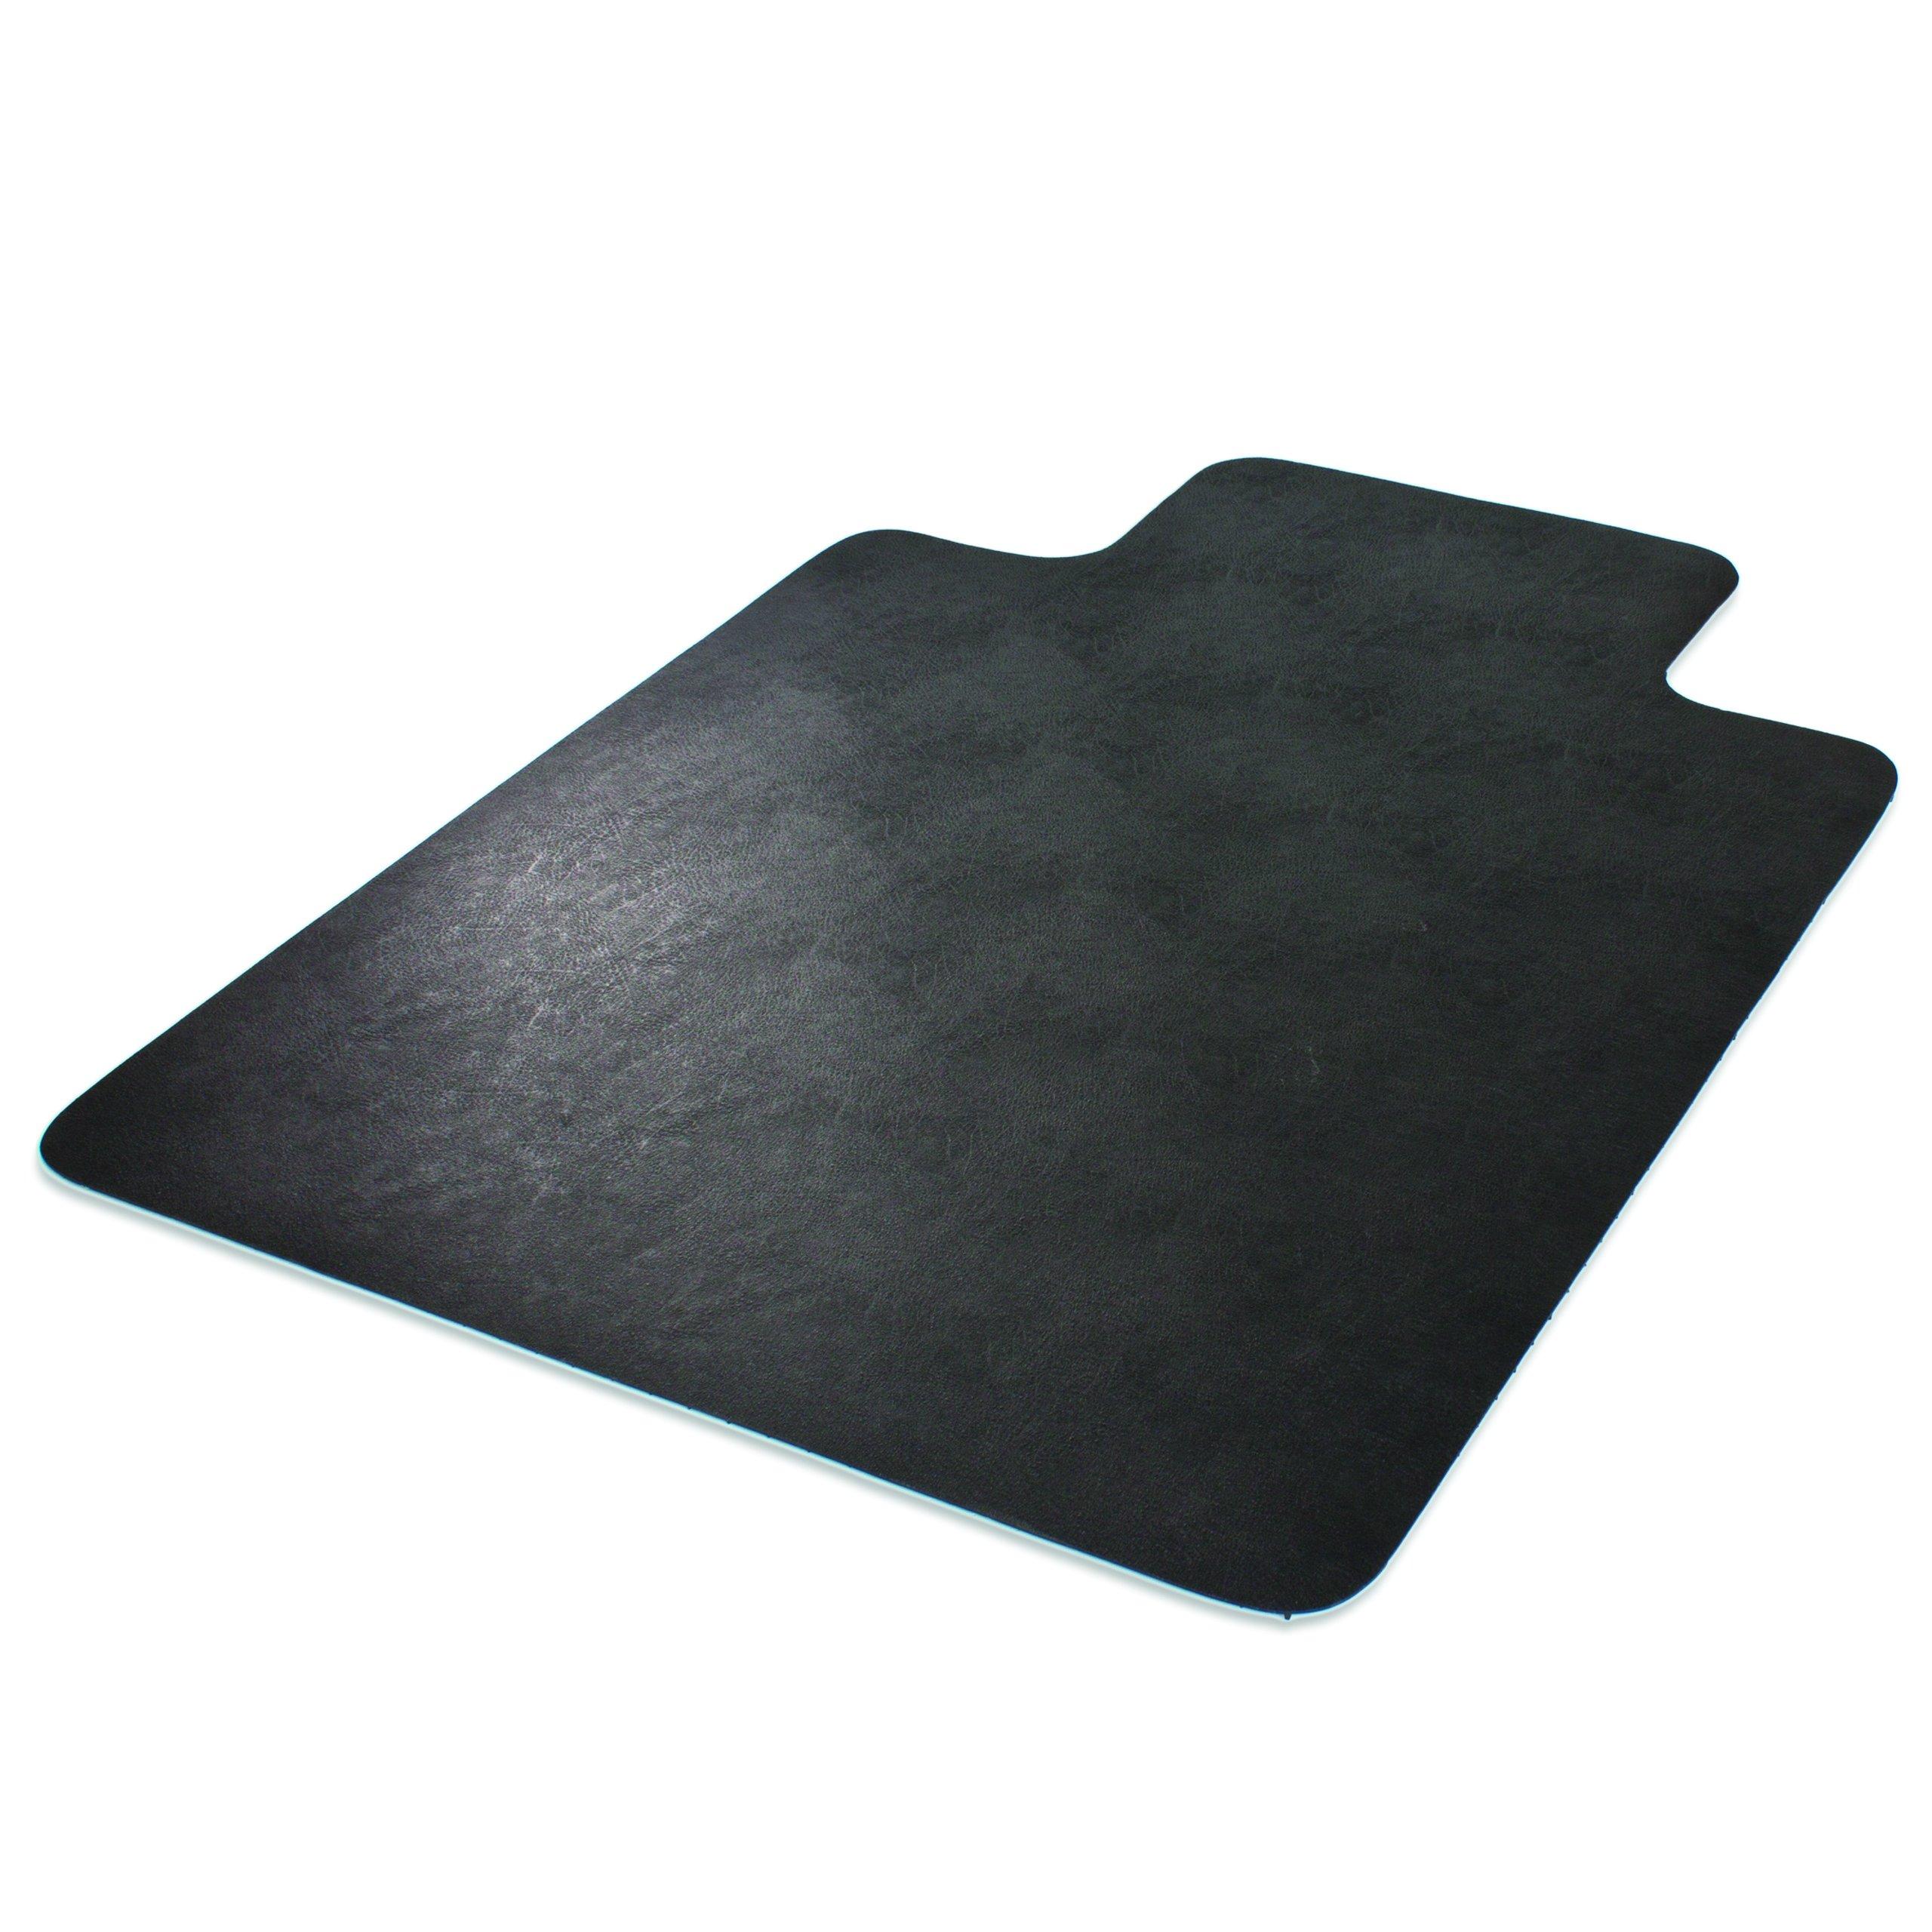 Deflecto EconoMat Chair Mat, Non-Studded for Hard Floors, Straight Edge, 36'' x 48'', Black (CM21112BLKCOM)